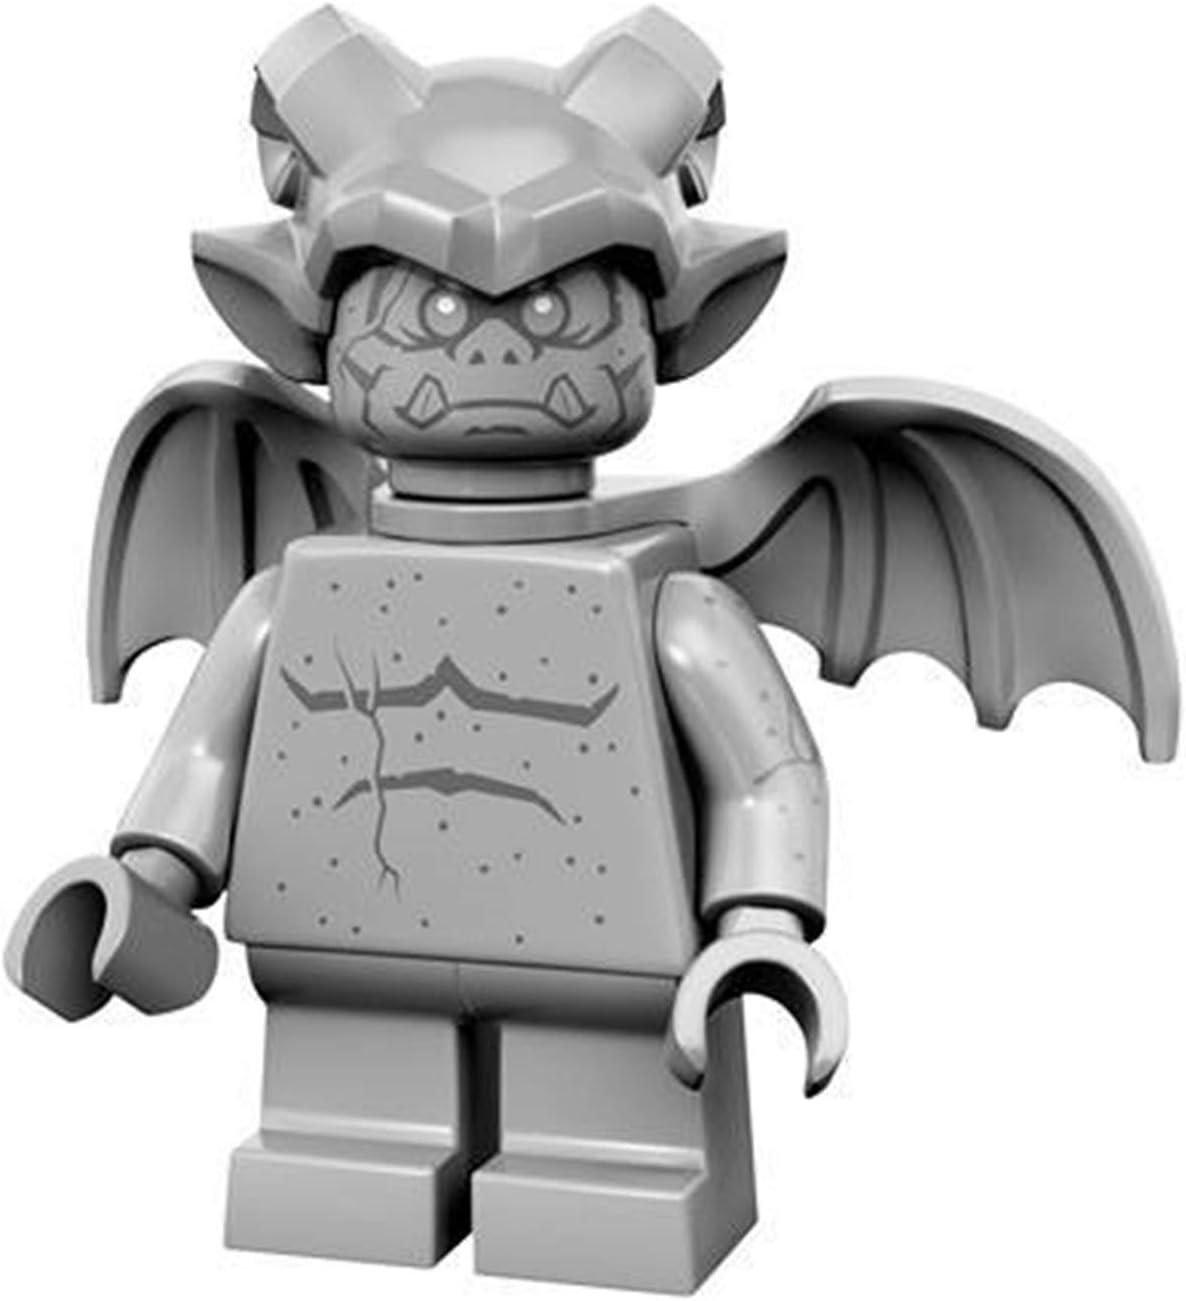 LEGO Series 14 Minifigure Gargoyle